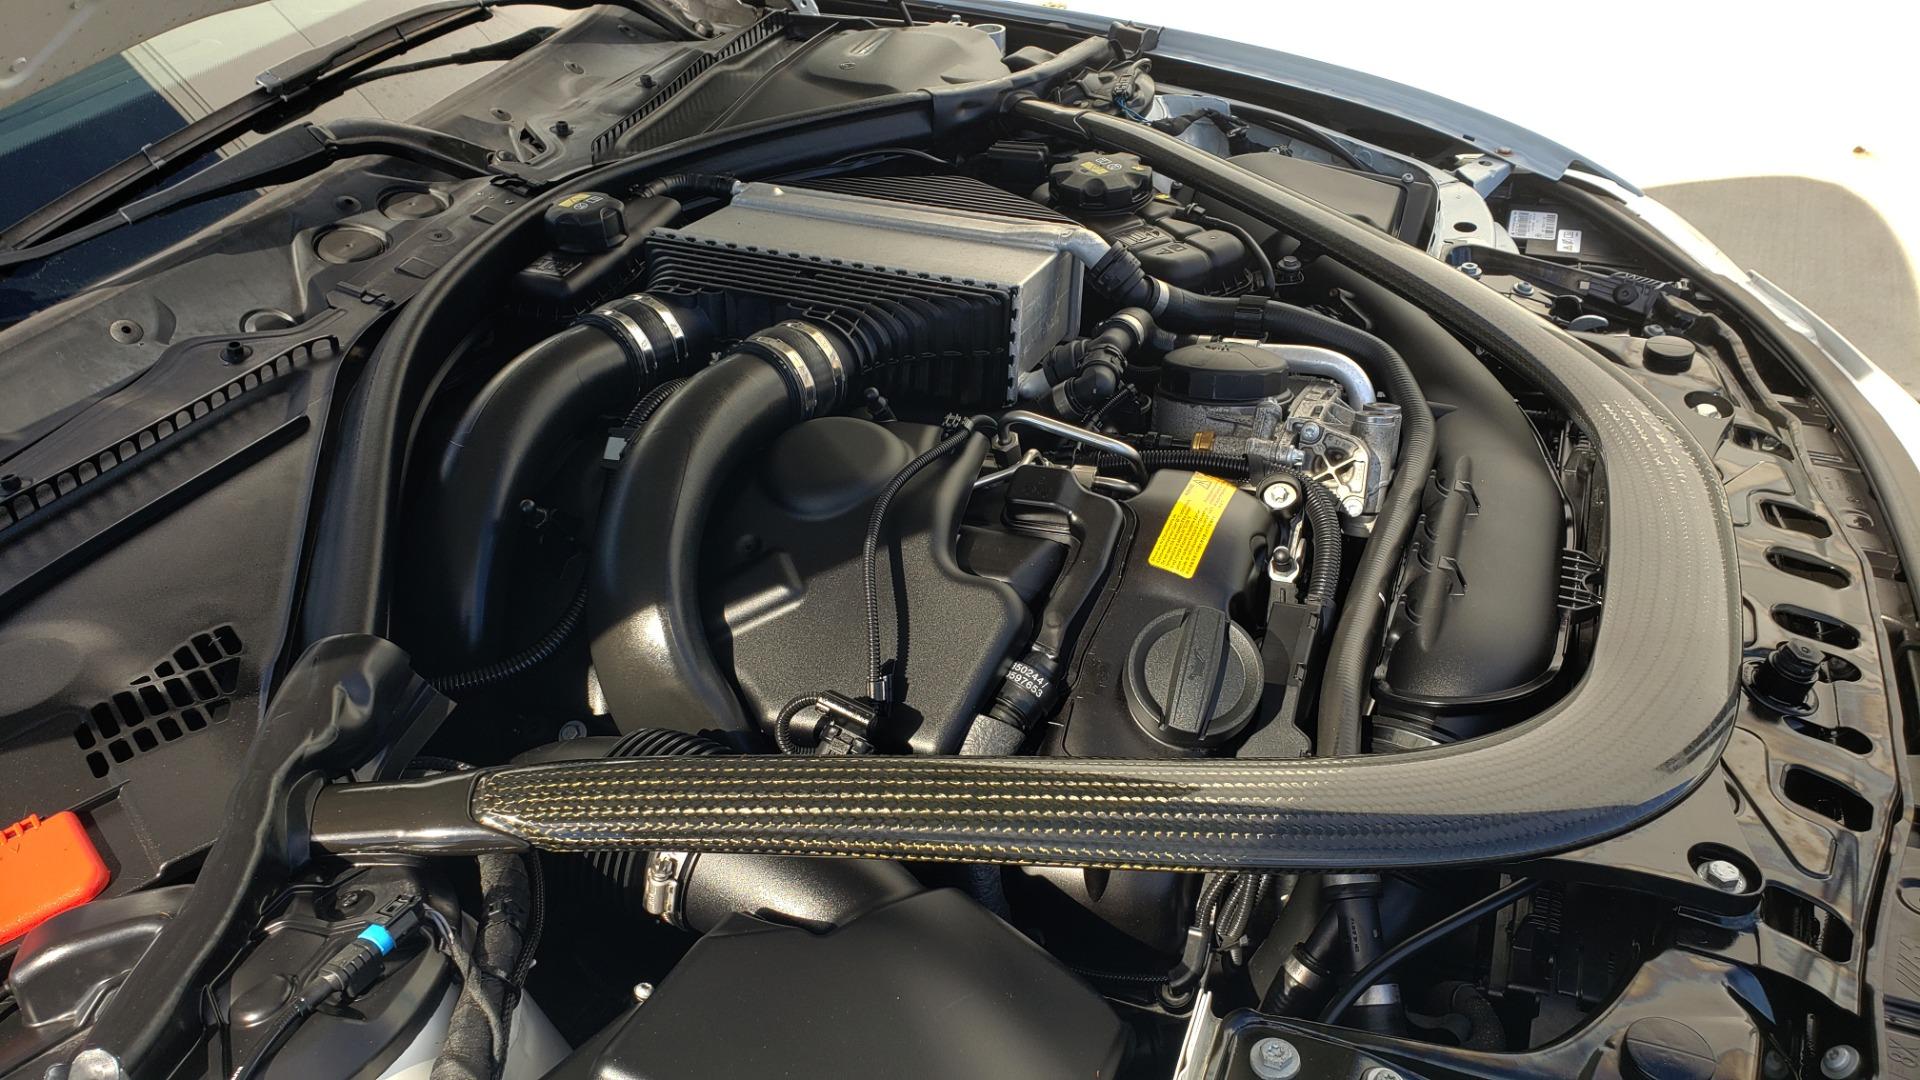 Used 2016 BMW M3 SEDAN / EXECUTIVE PKG / M-SUSPENSION / HARMAN/KARDON SOUND for sale Sold at Formula Imports in Charlotte NC 28227 25